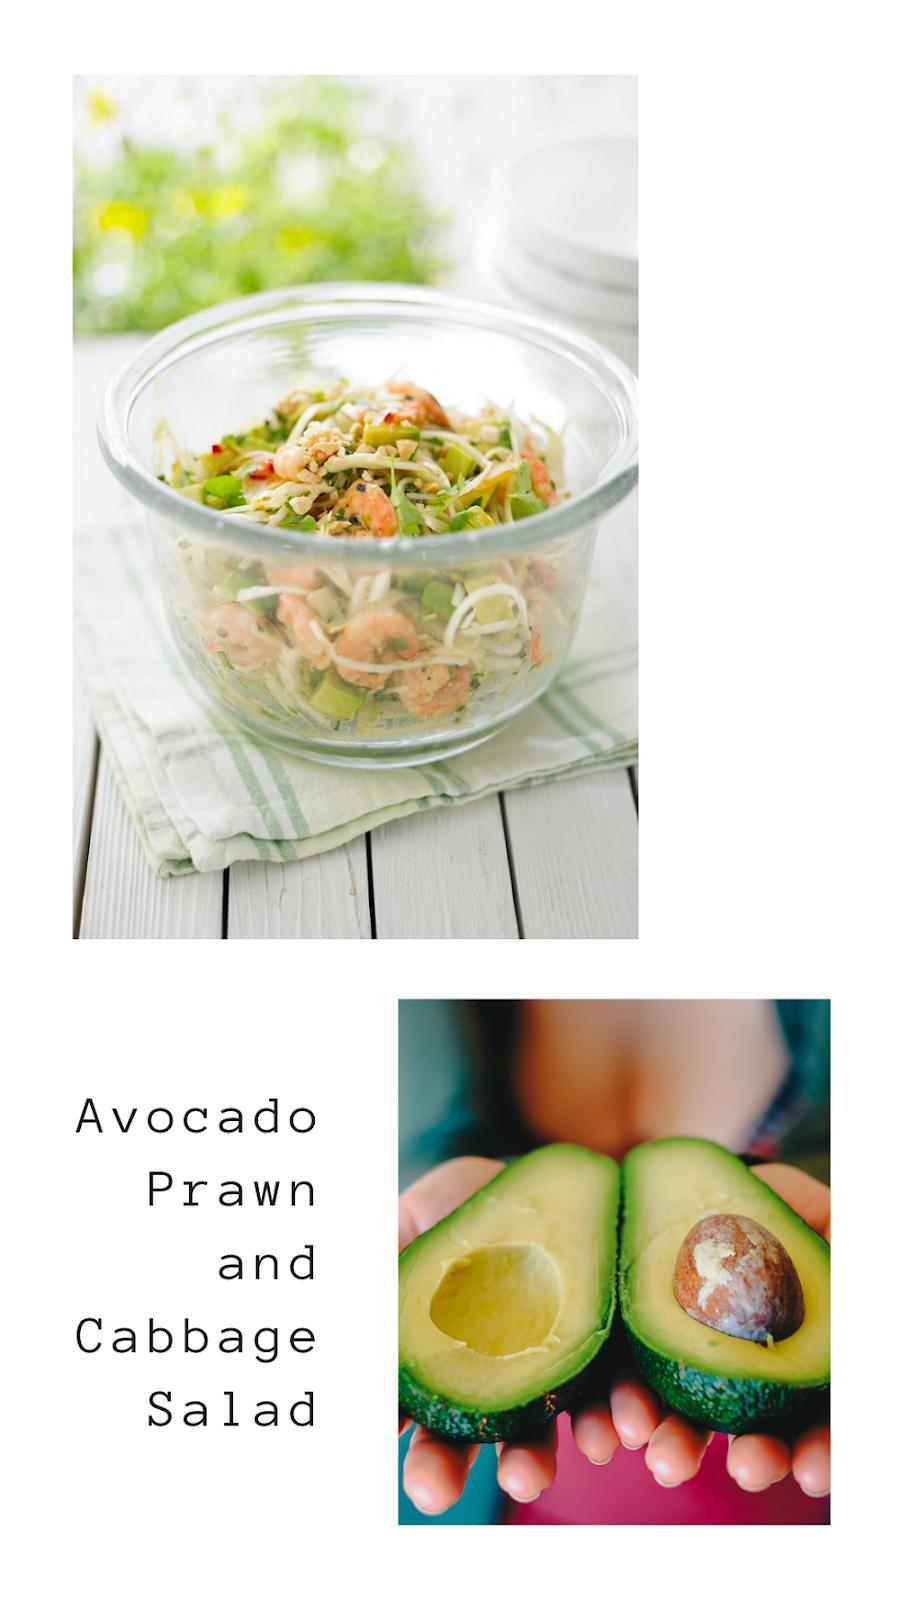 Avocado, Prawn and Cabbage Salad.